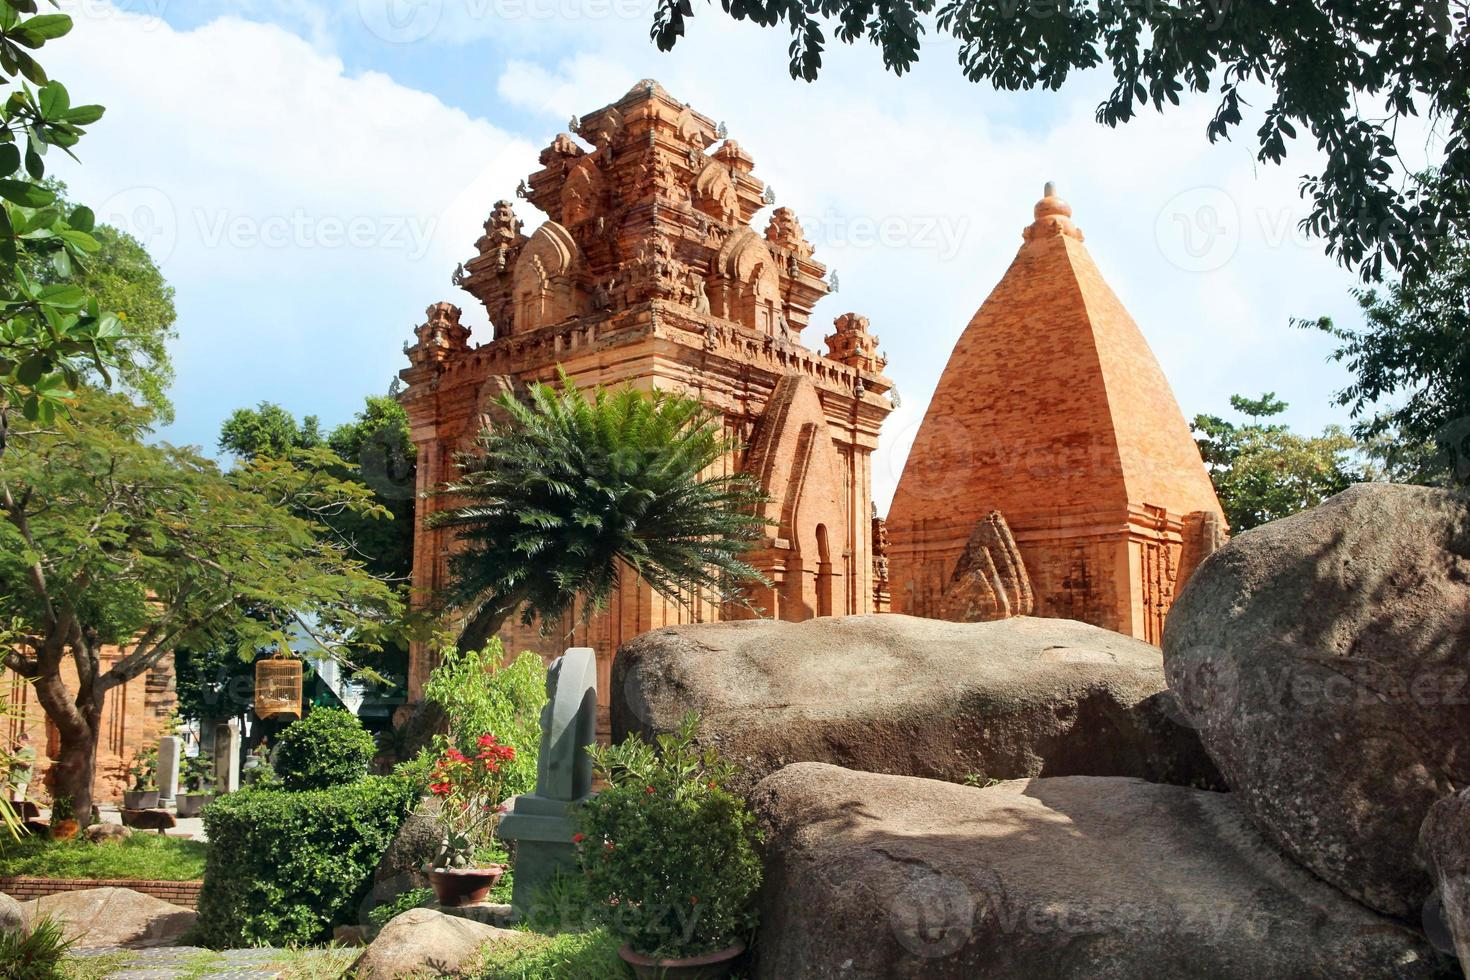 torri cham civilization. Nha Trang, Vietnam foto